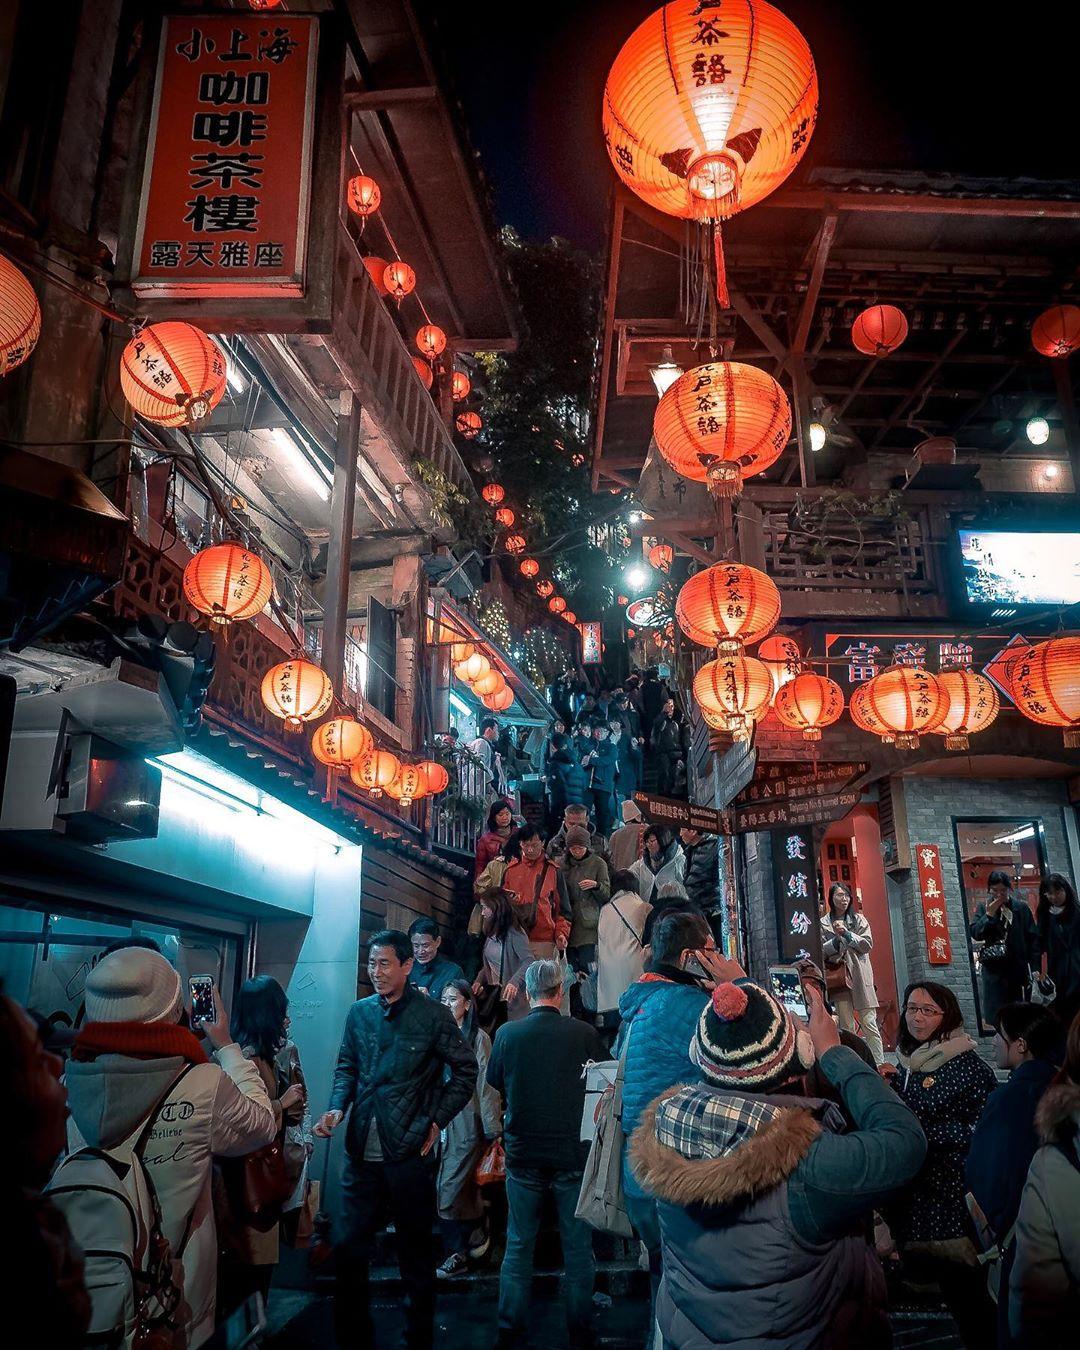 tokyo-nightlife-photography-hosokawa-ryohei-9